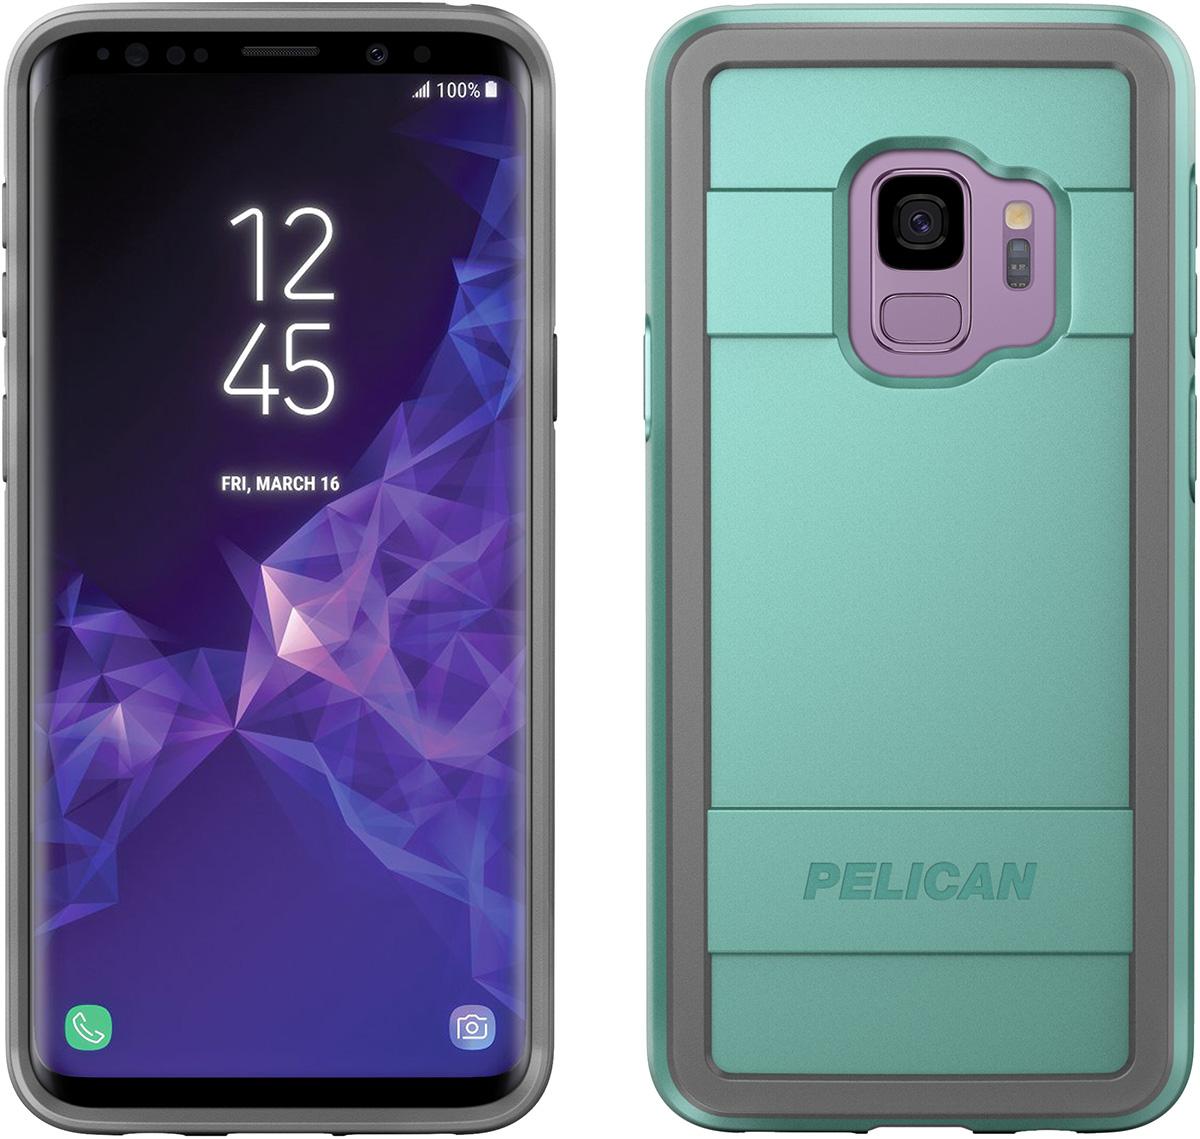 pelican galaxy s9 cases samsung phone cases